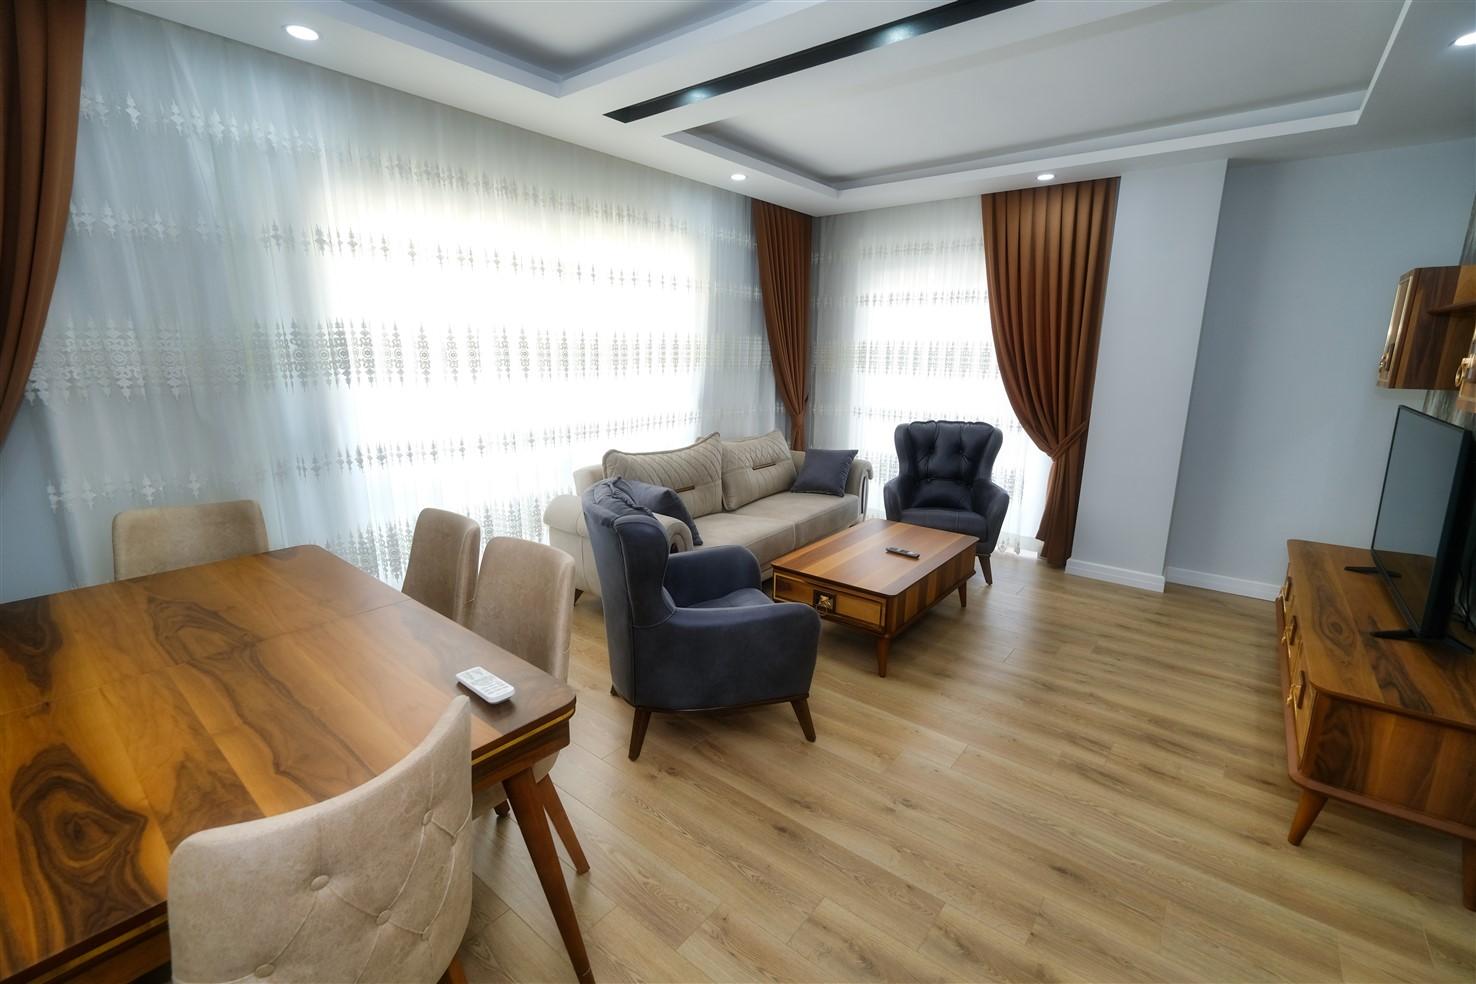 Трёхкомнатная квартира в центре Антальи - Фото 19